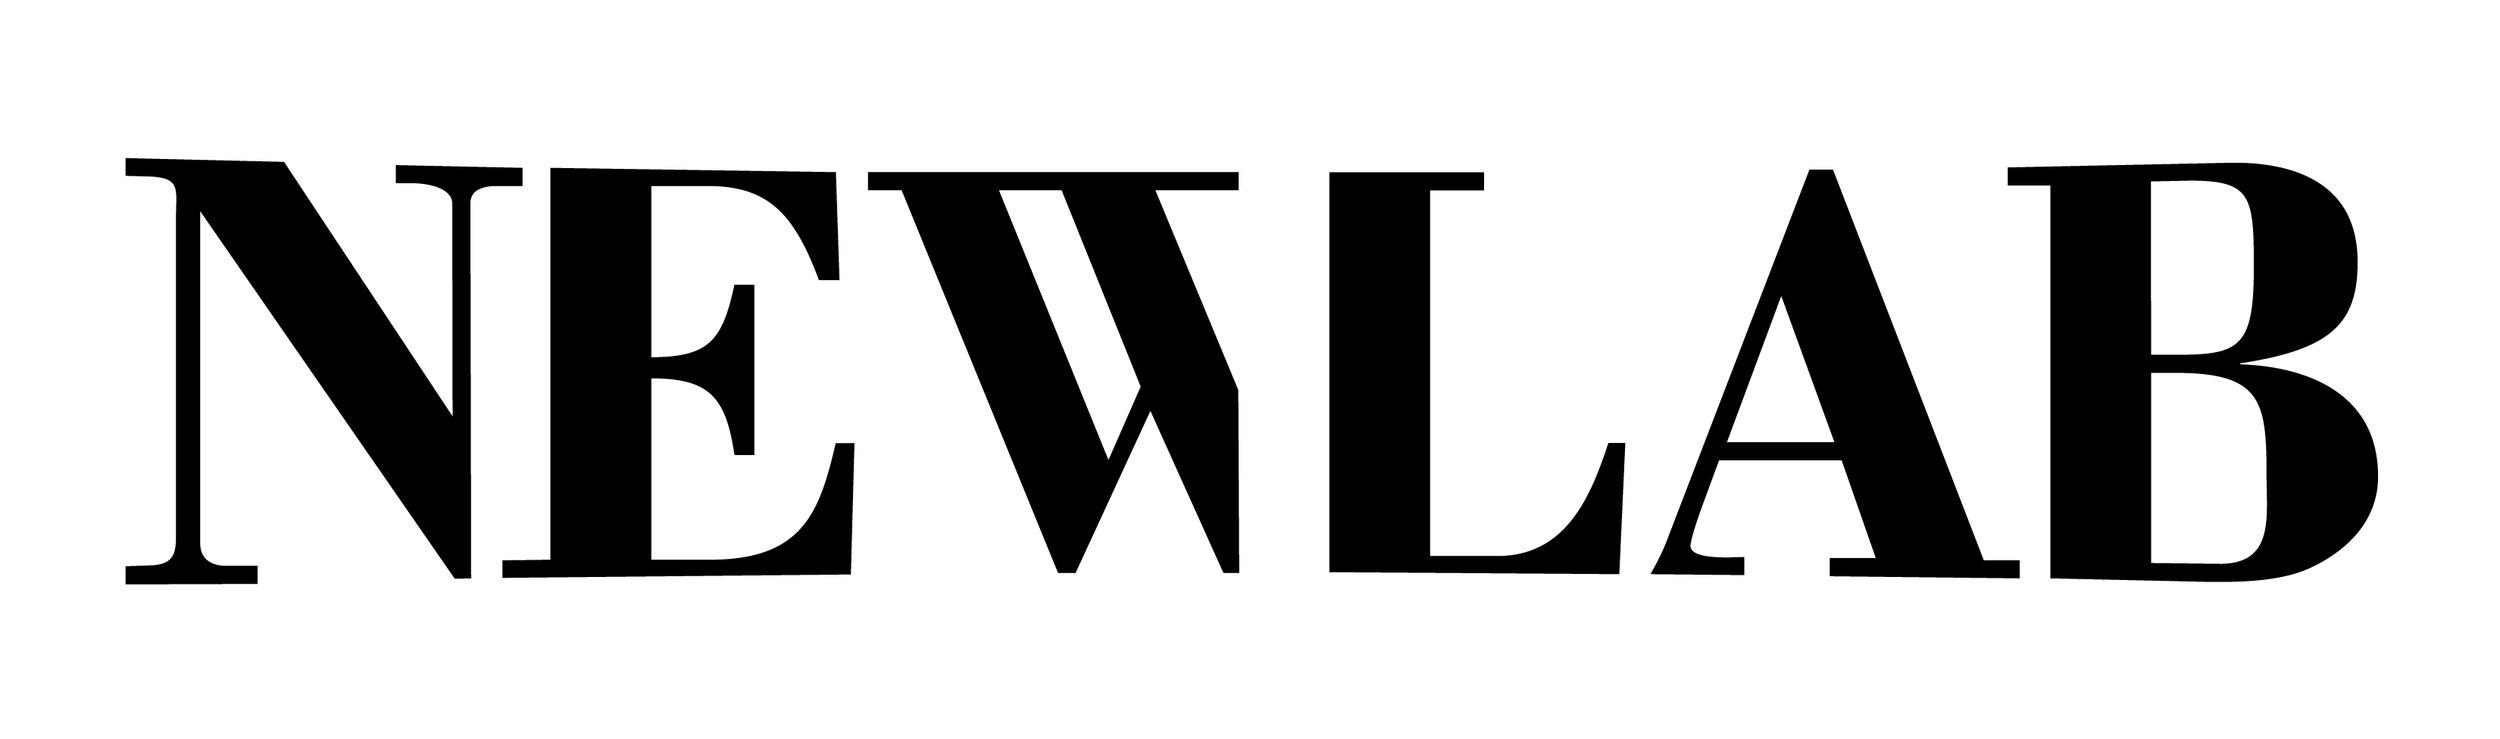 NewLab logo.jpg